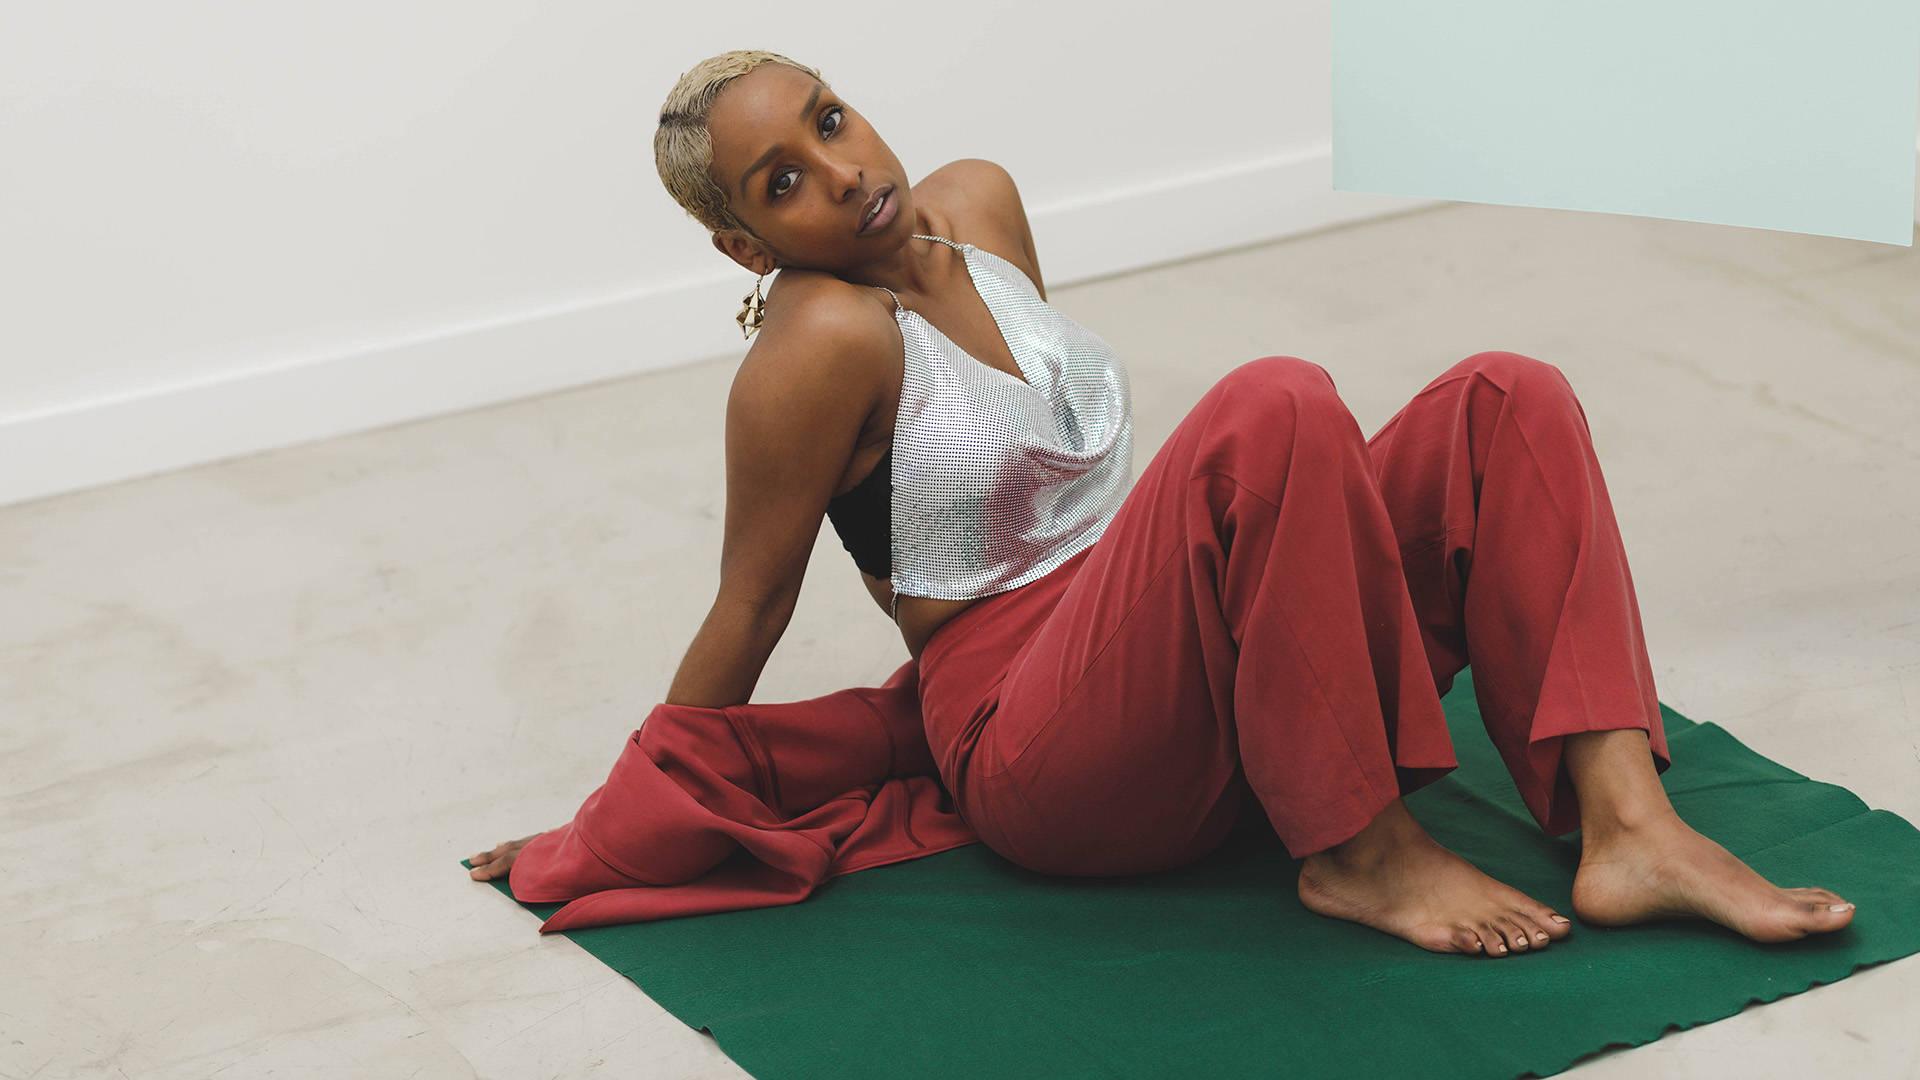 Oakland singer Astu left her life as a preacher behind, finding herself in music instead. Pablo Circa